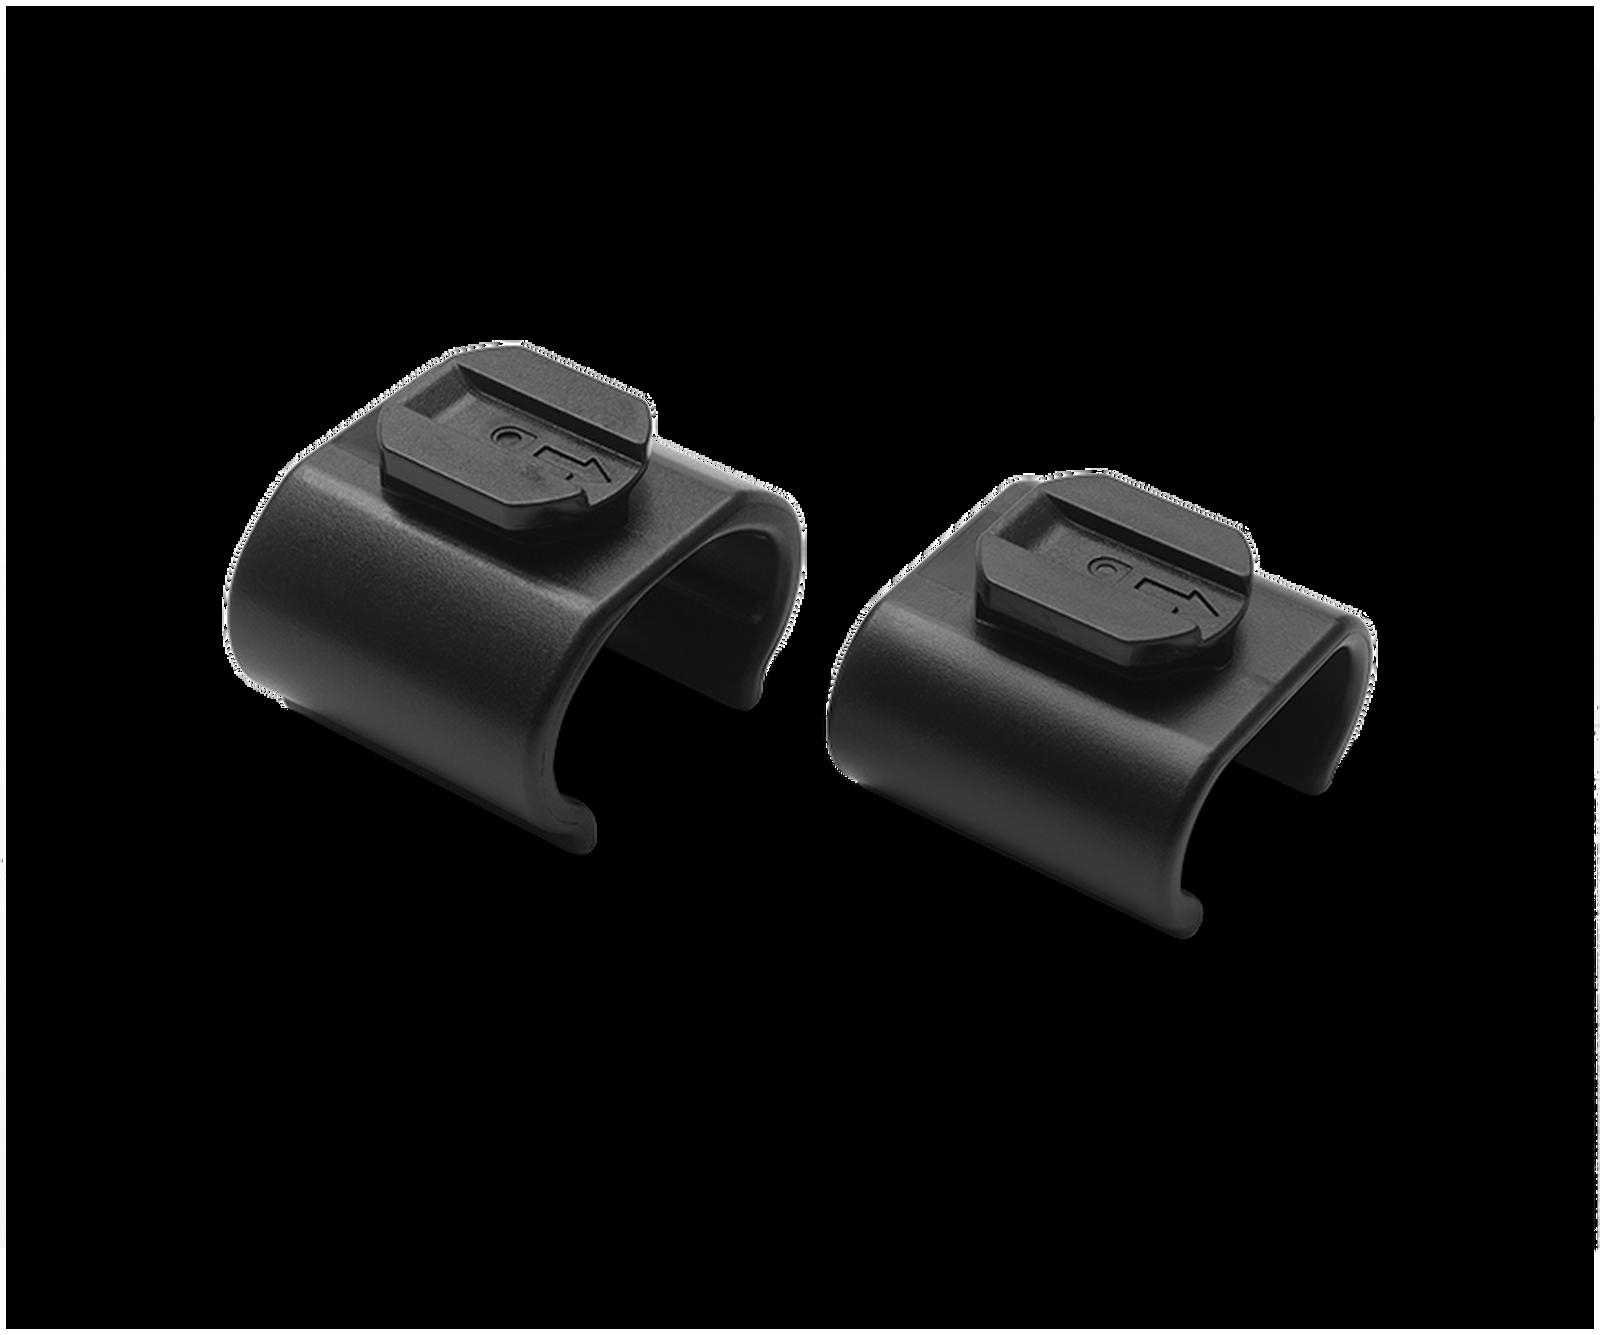 Bugaboo parasol adapter set (2017 model) Black